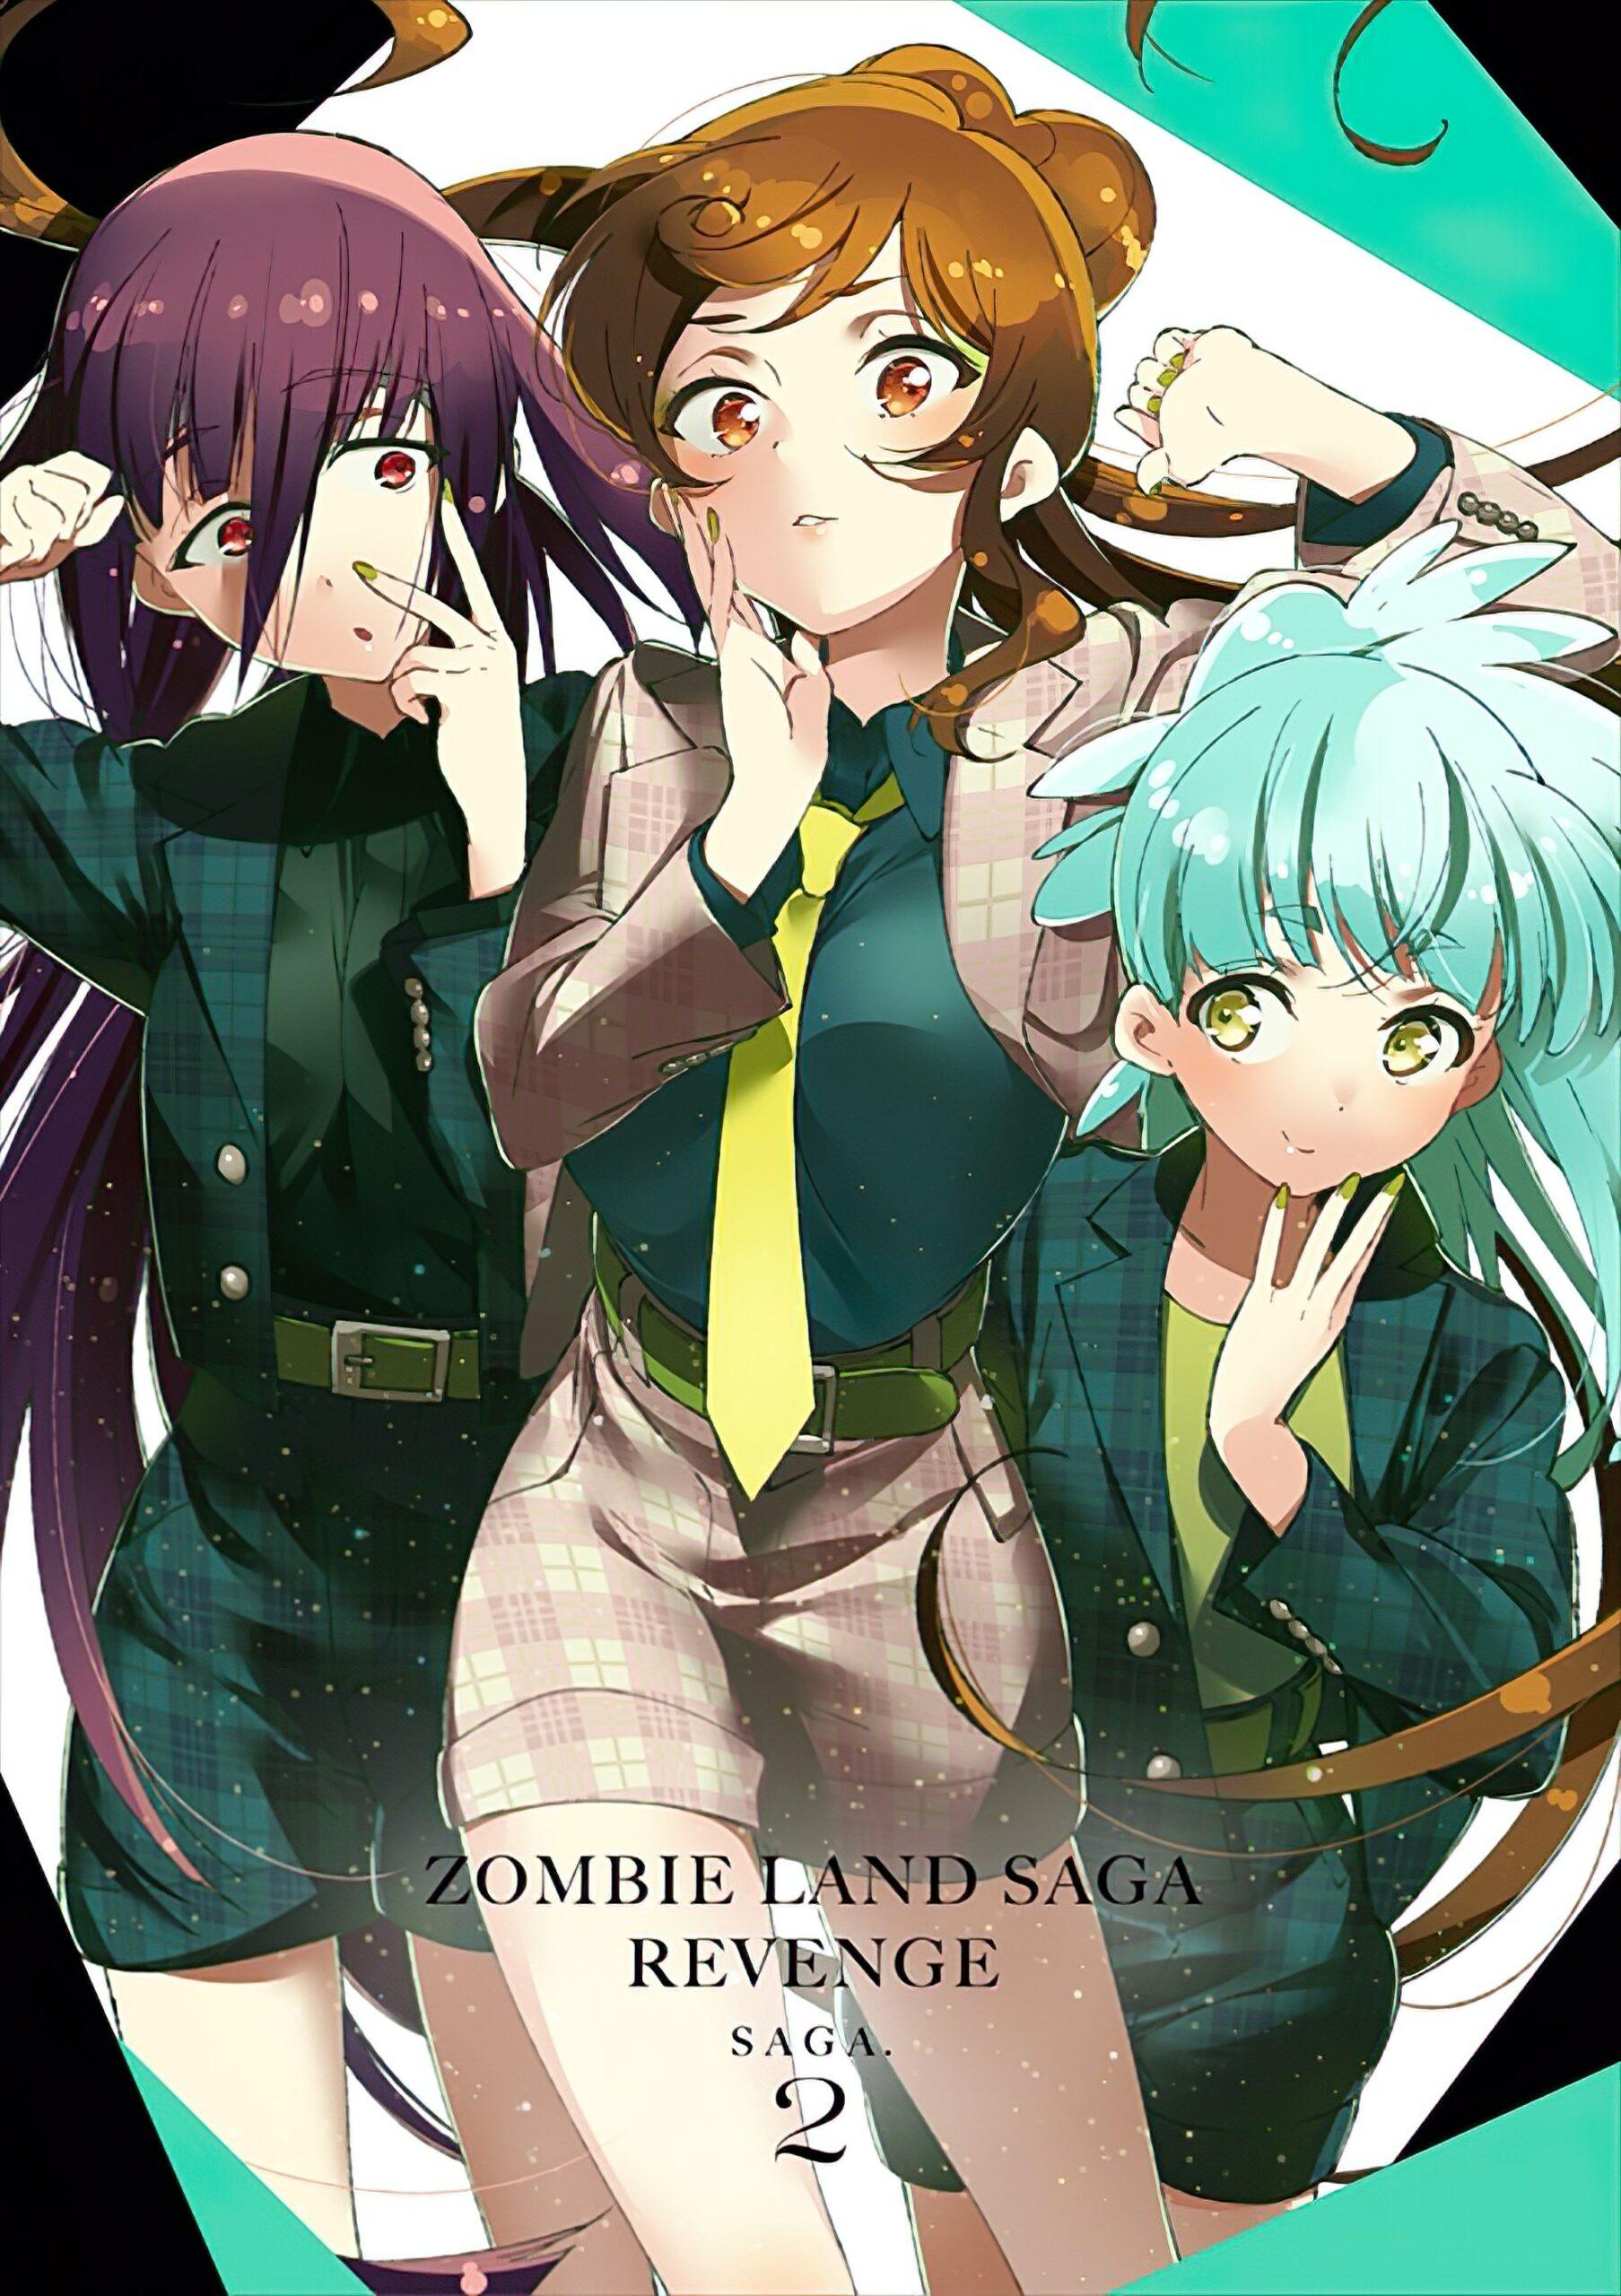 Zombieland Saga: Revenge